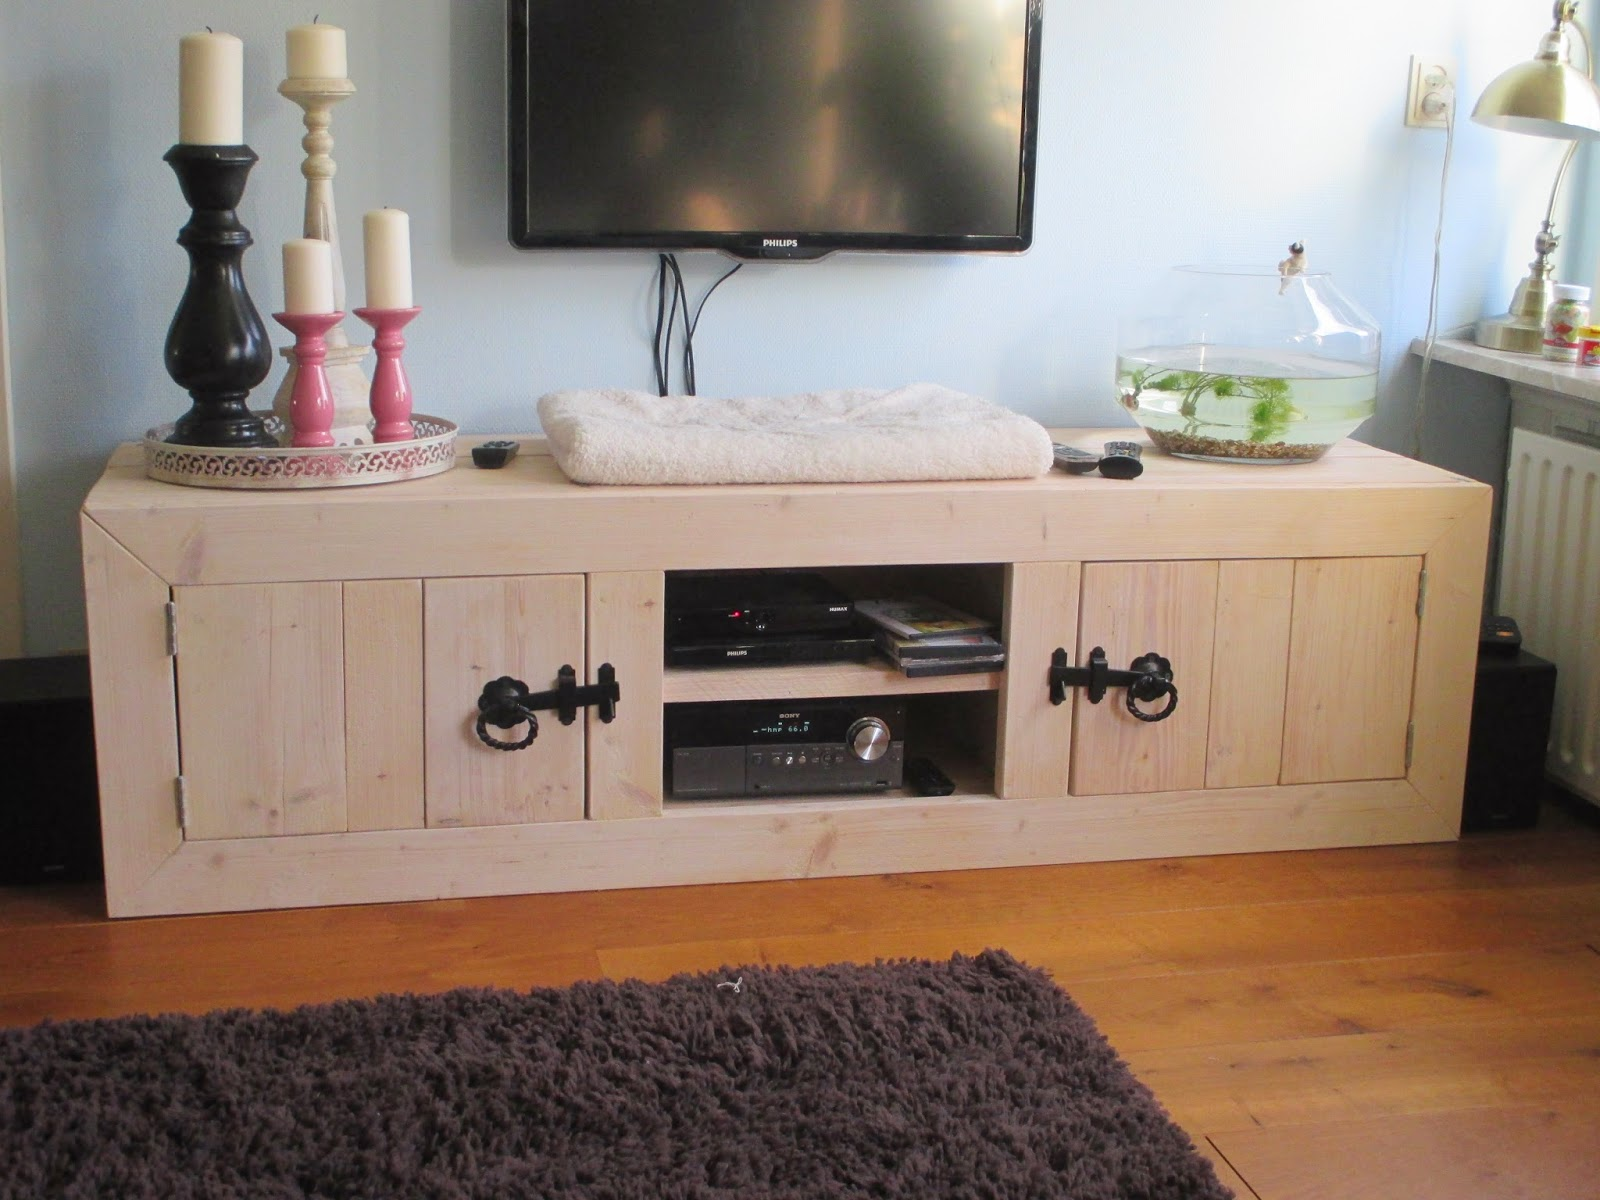 Meubels in huis for Woning meubels